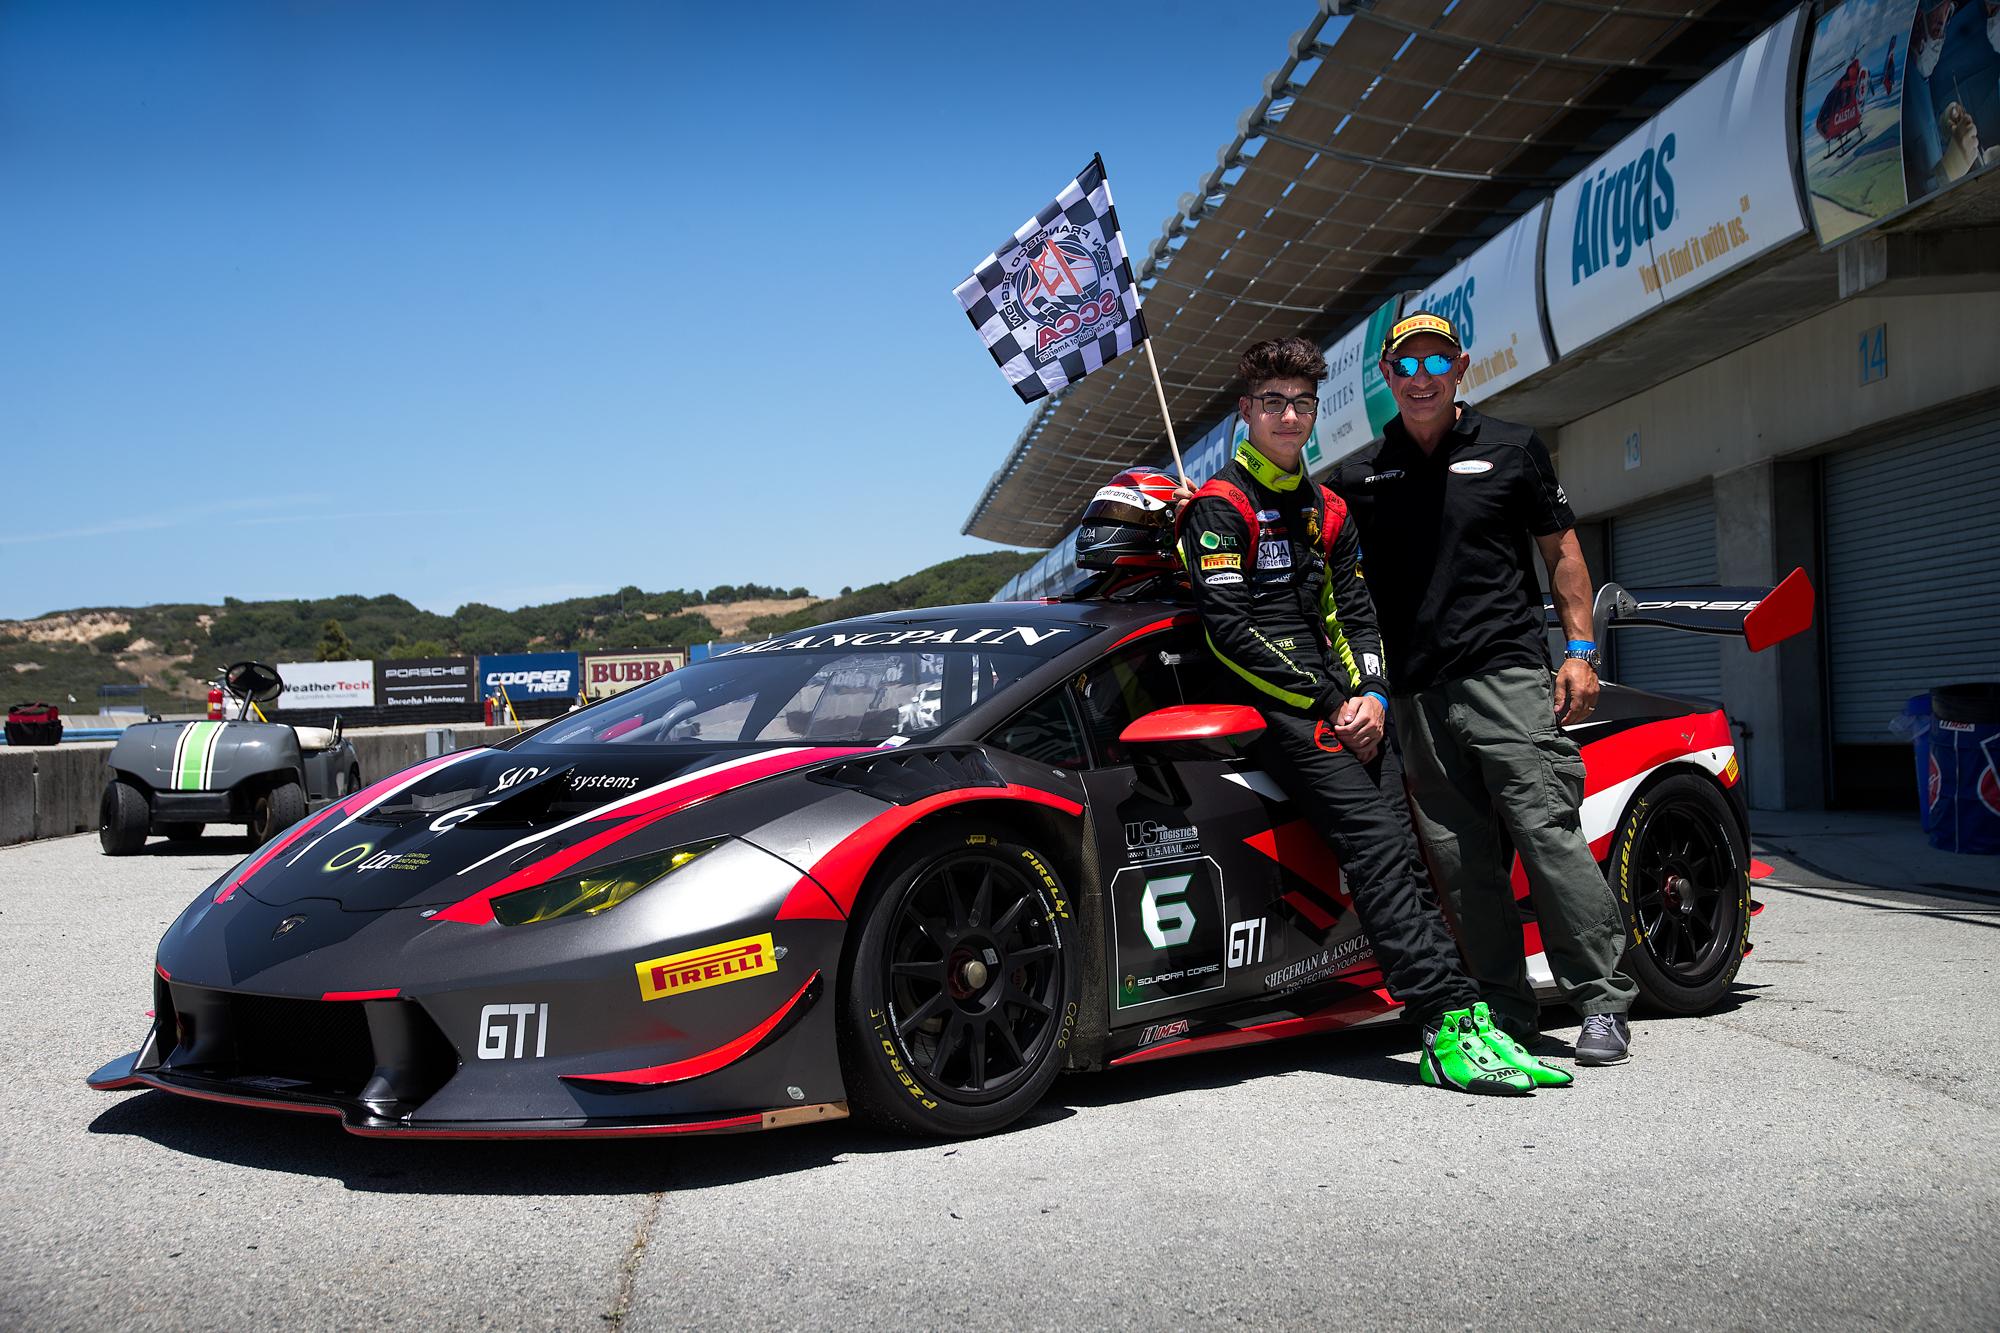 Steven-Racing-Laguna-20180603-97452.jpg